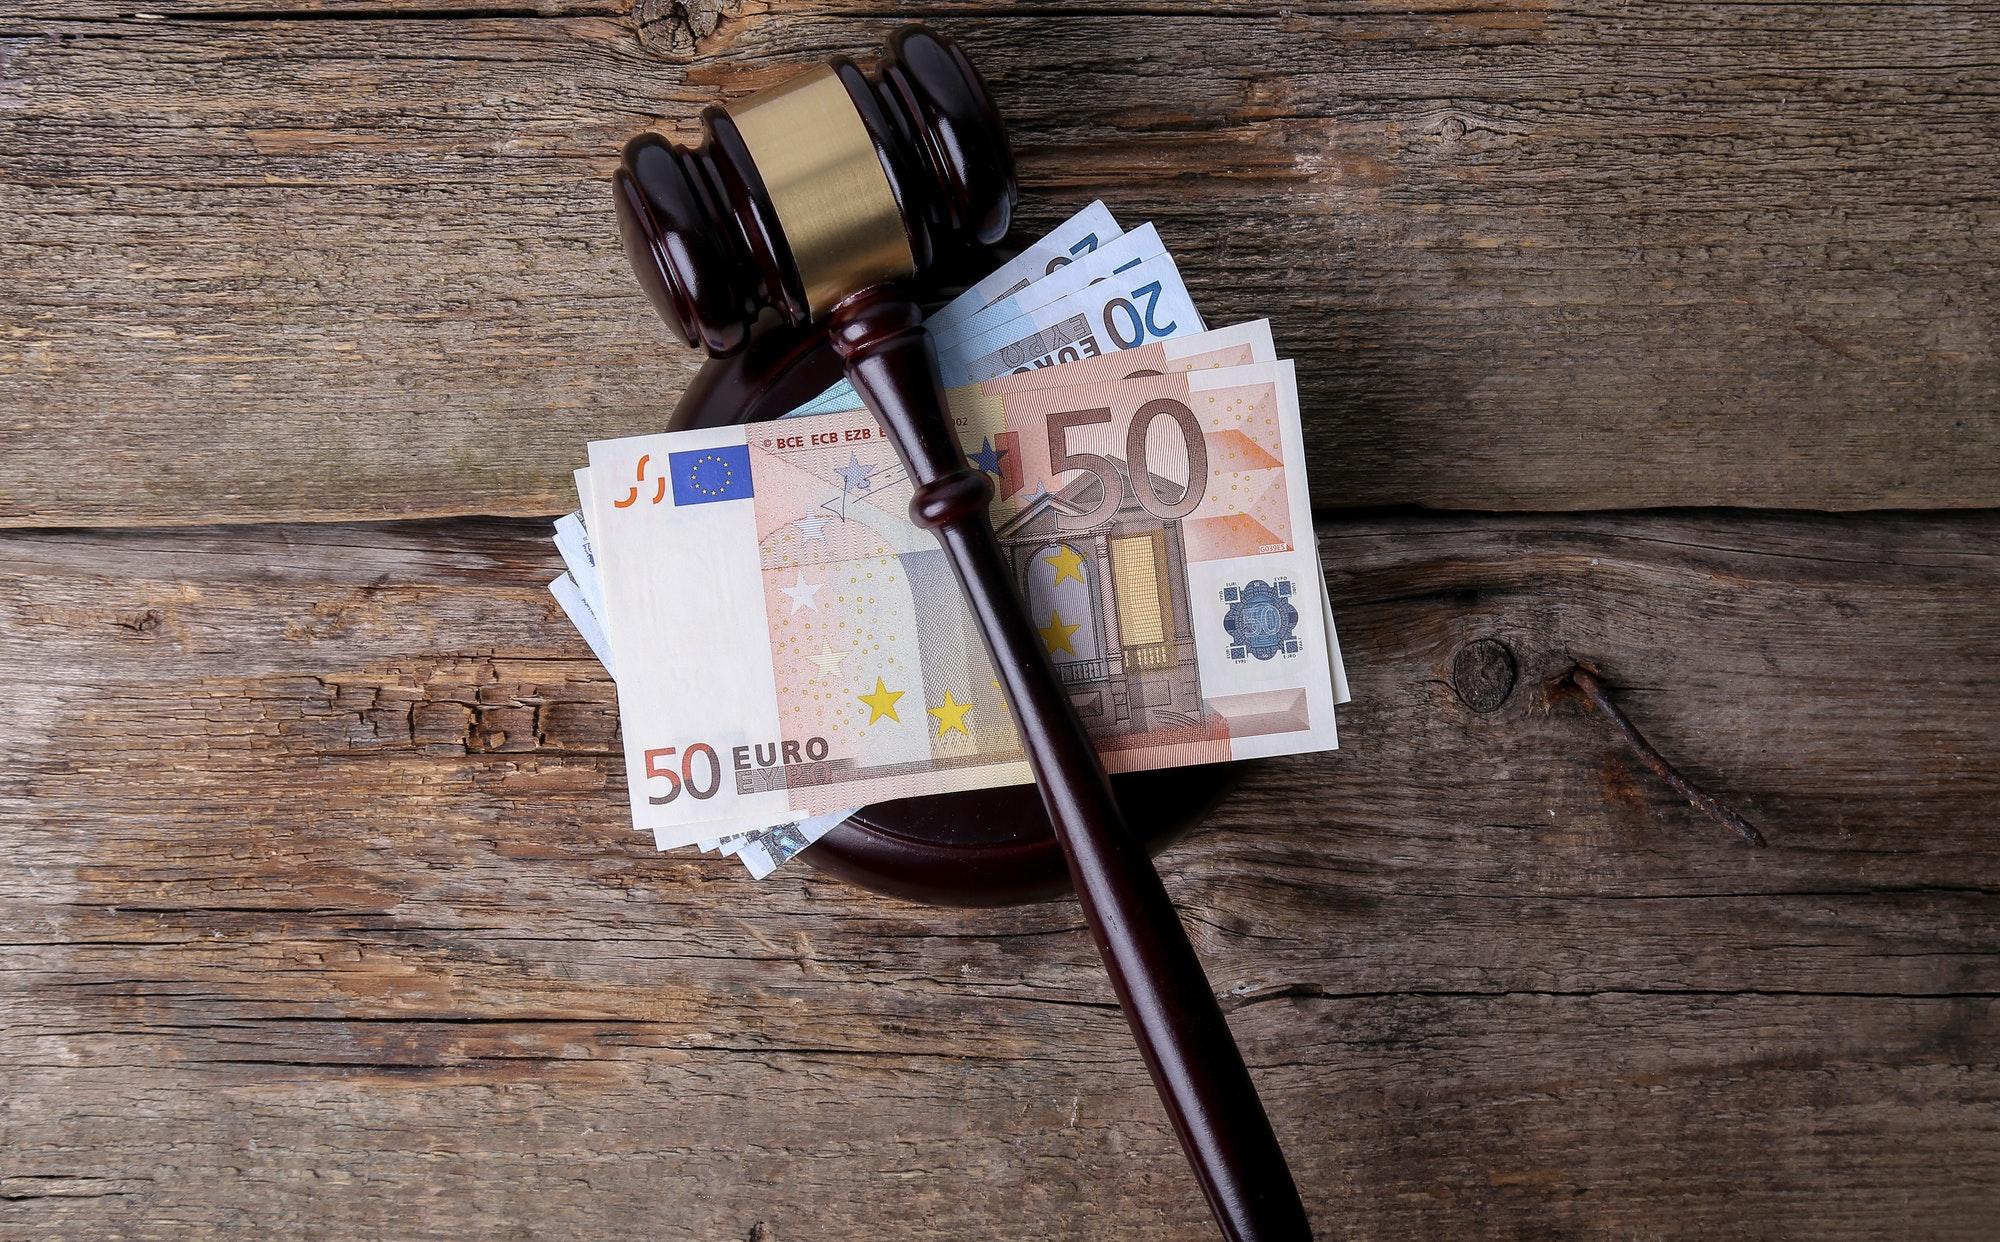 particuliers-avocat-fiscalite-contentieuxagn-avocats.jpg